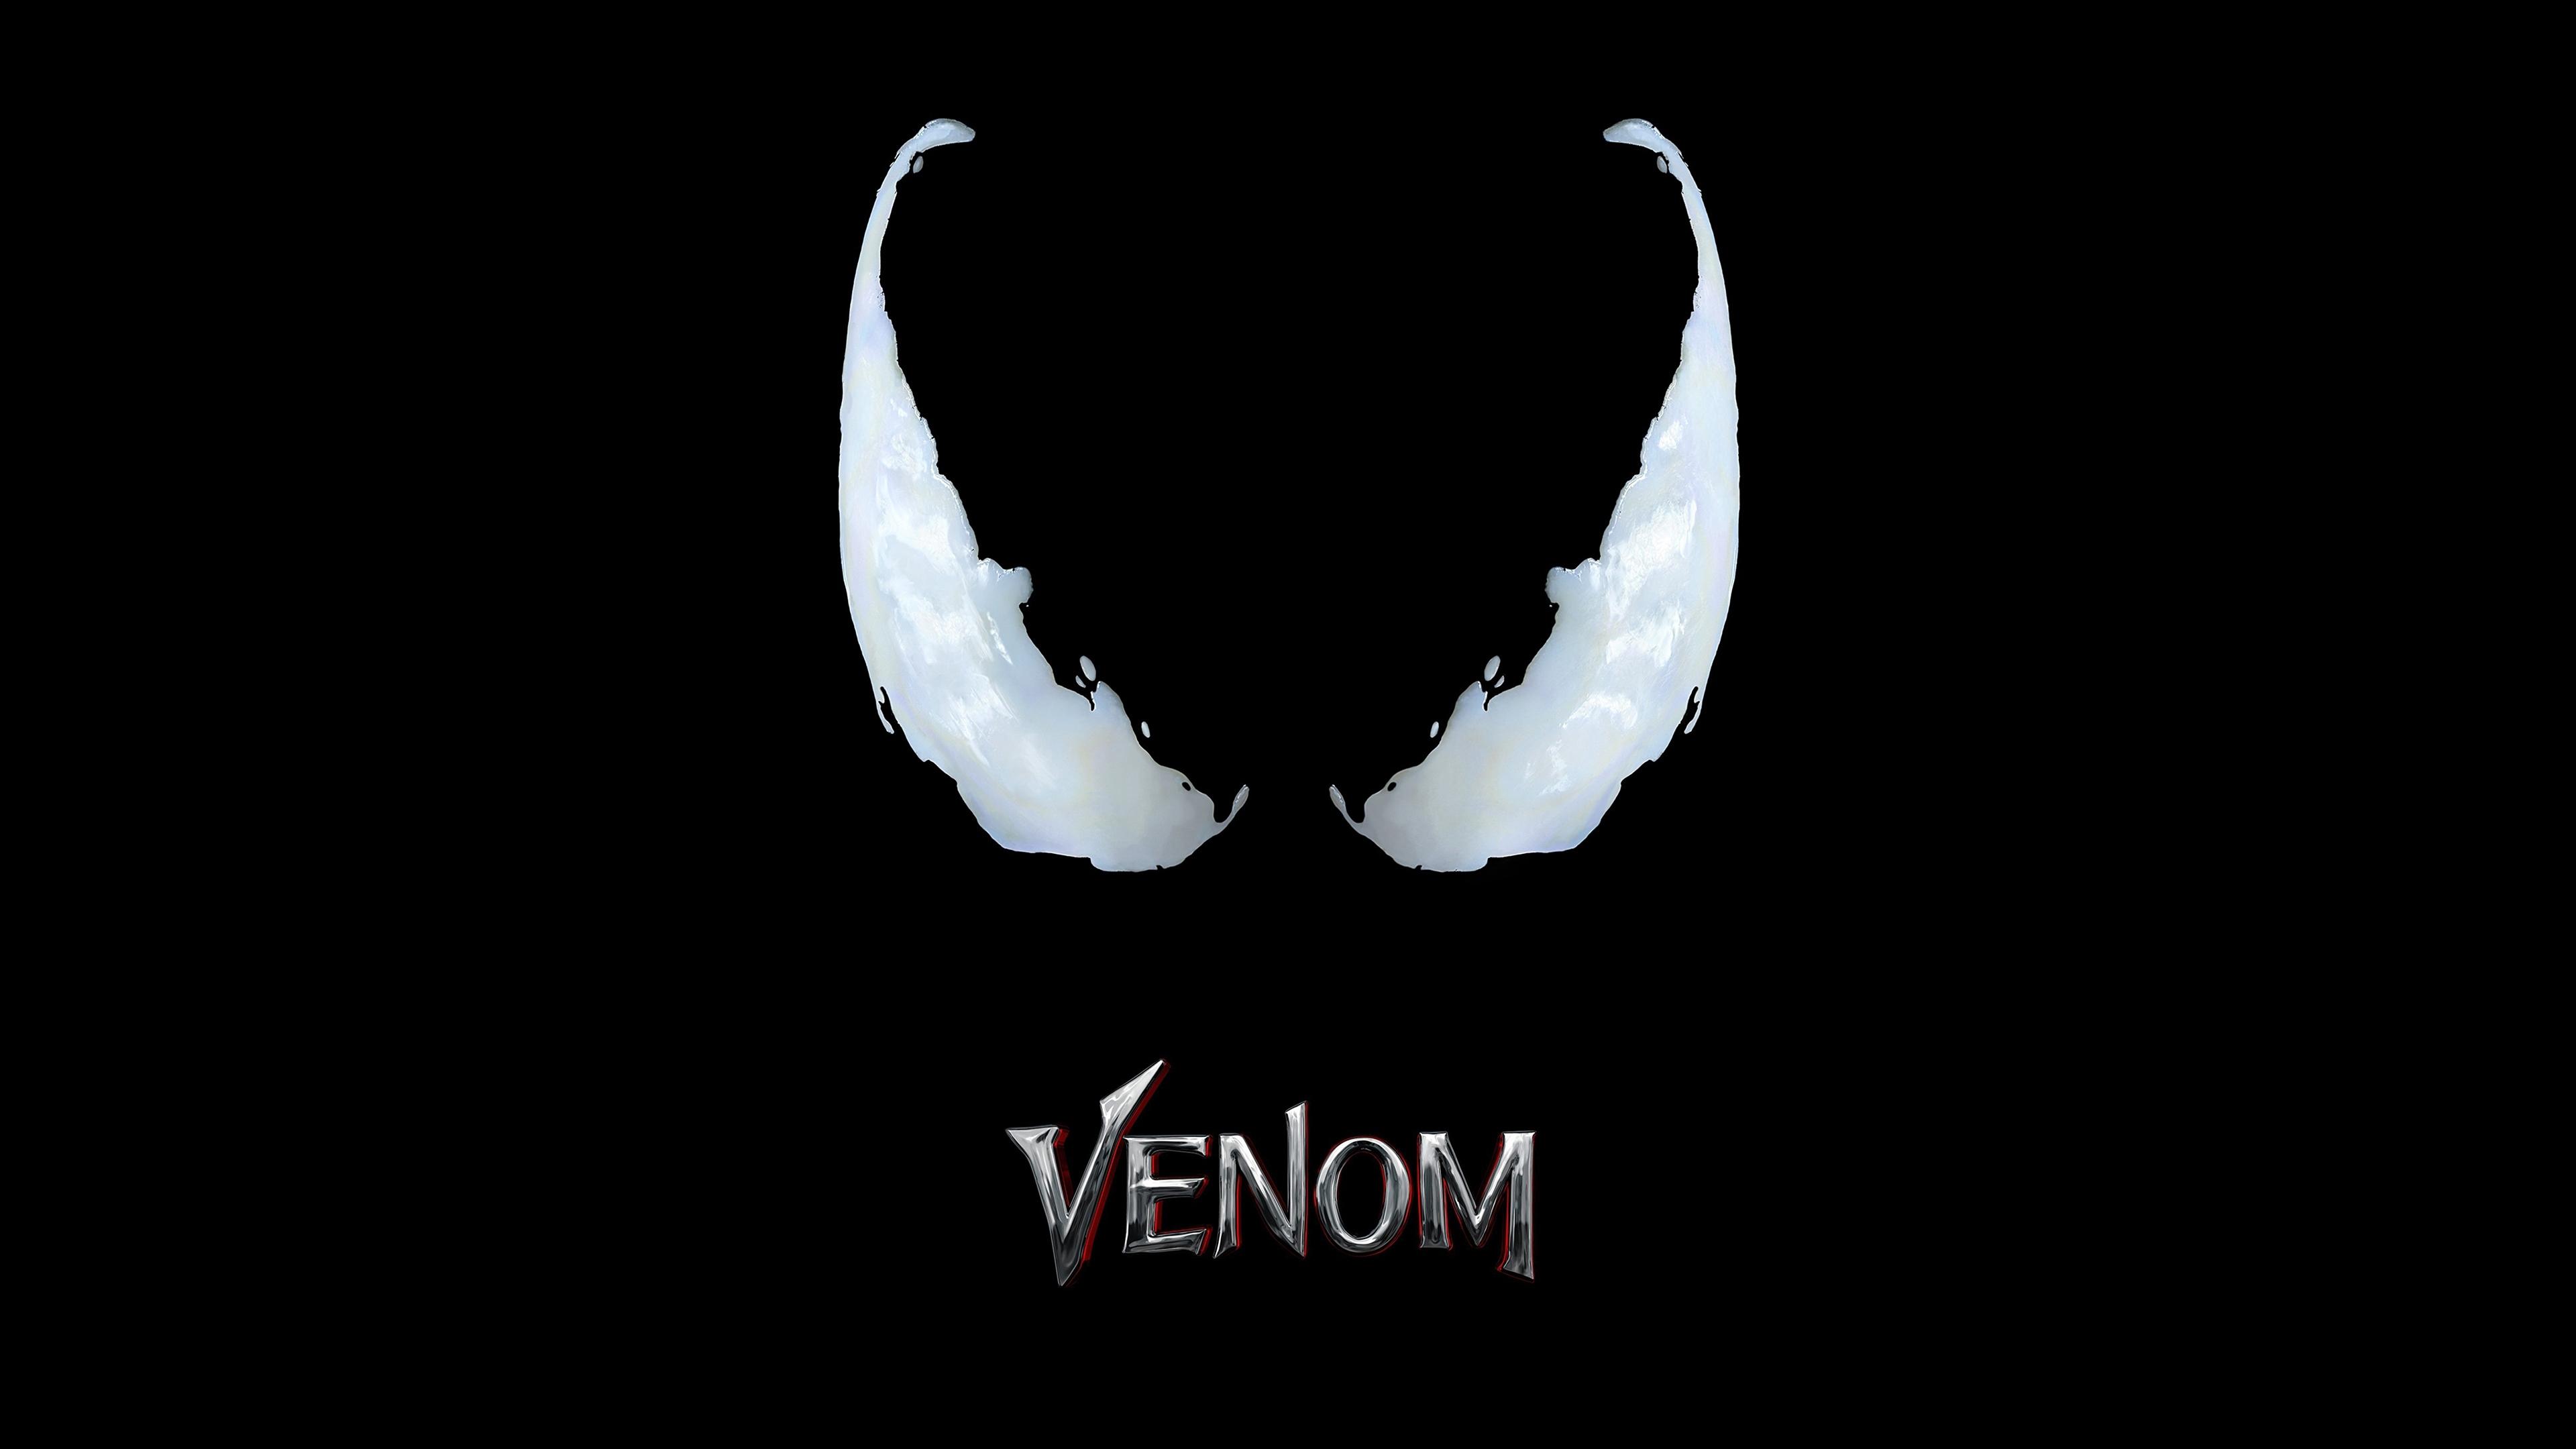 Venom Chromebook Wallpaper